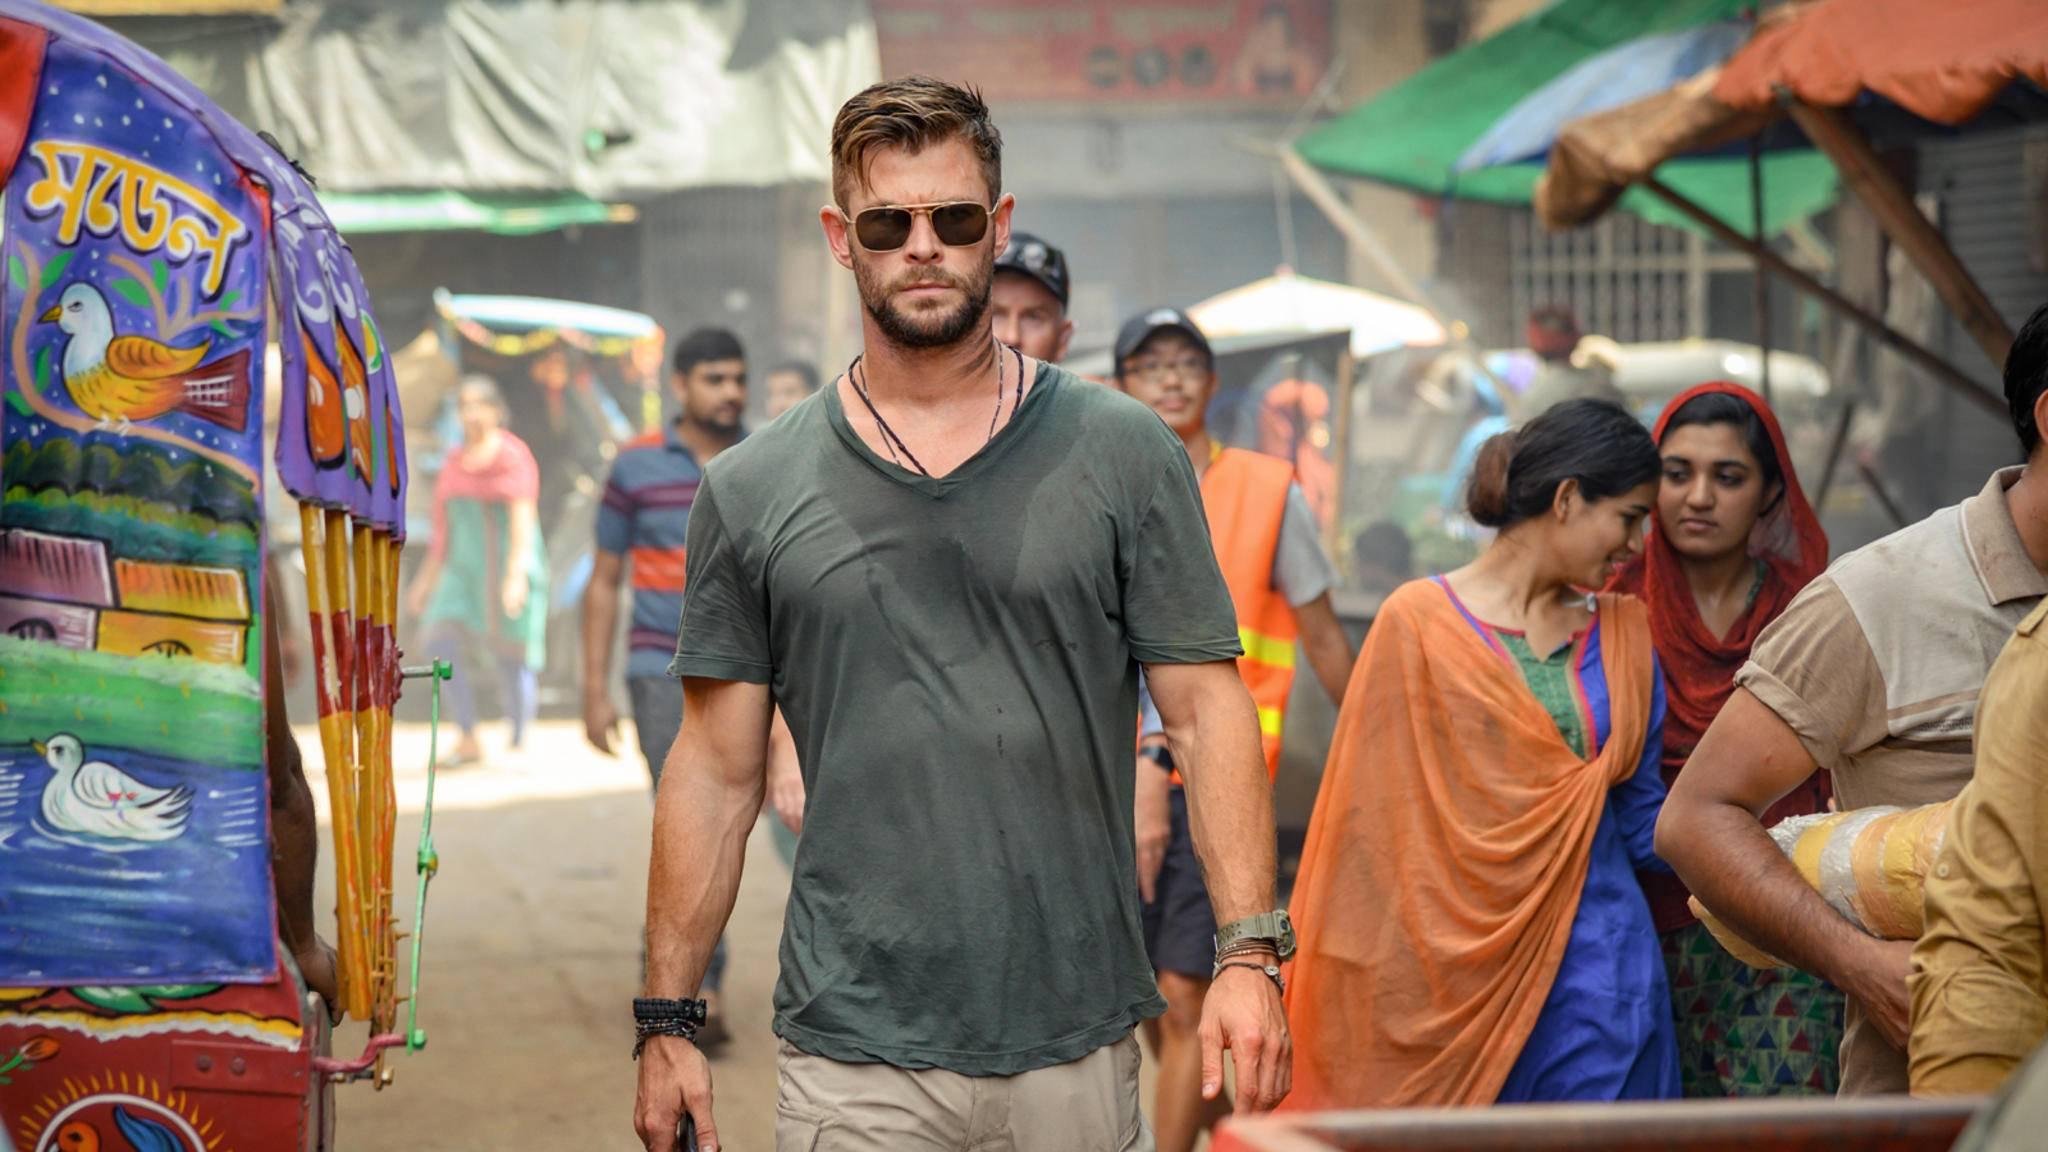 Extraction Chris Hemsworth